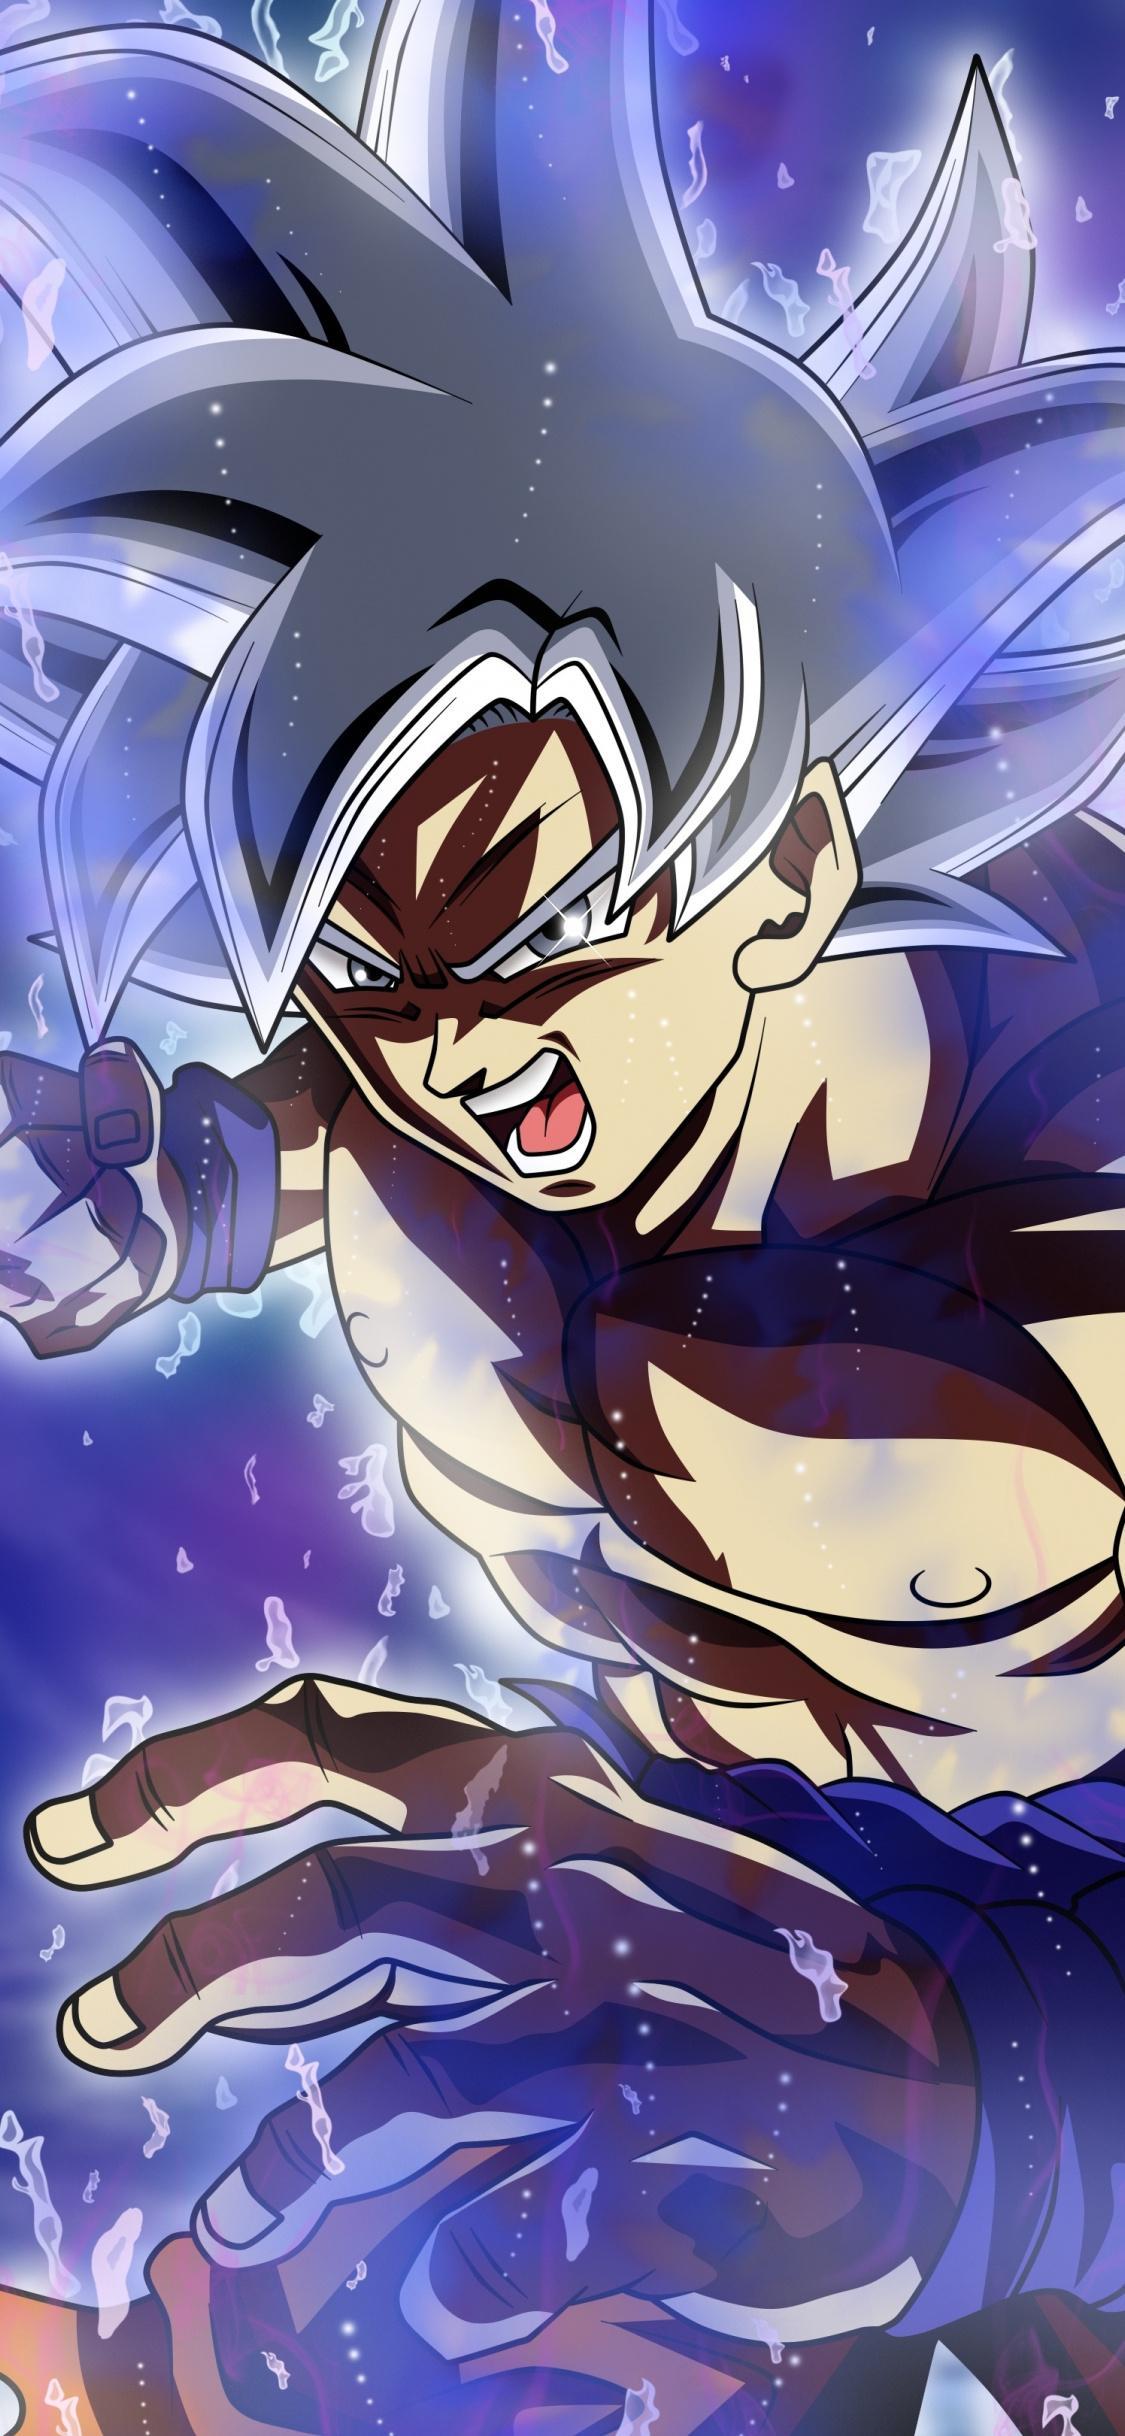 Ultra Instinct Goku iPhone Wallpapers - Wallpaper Cave